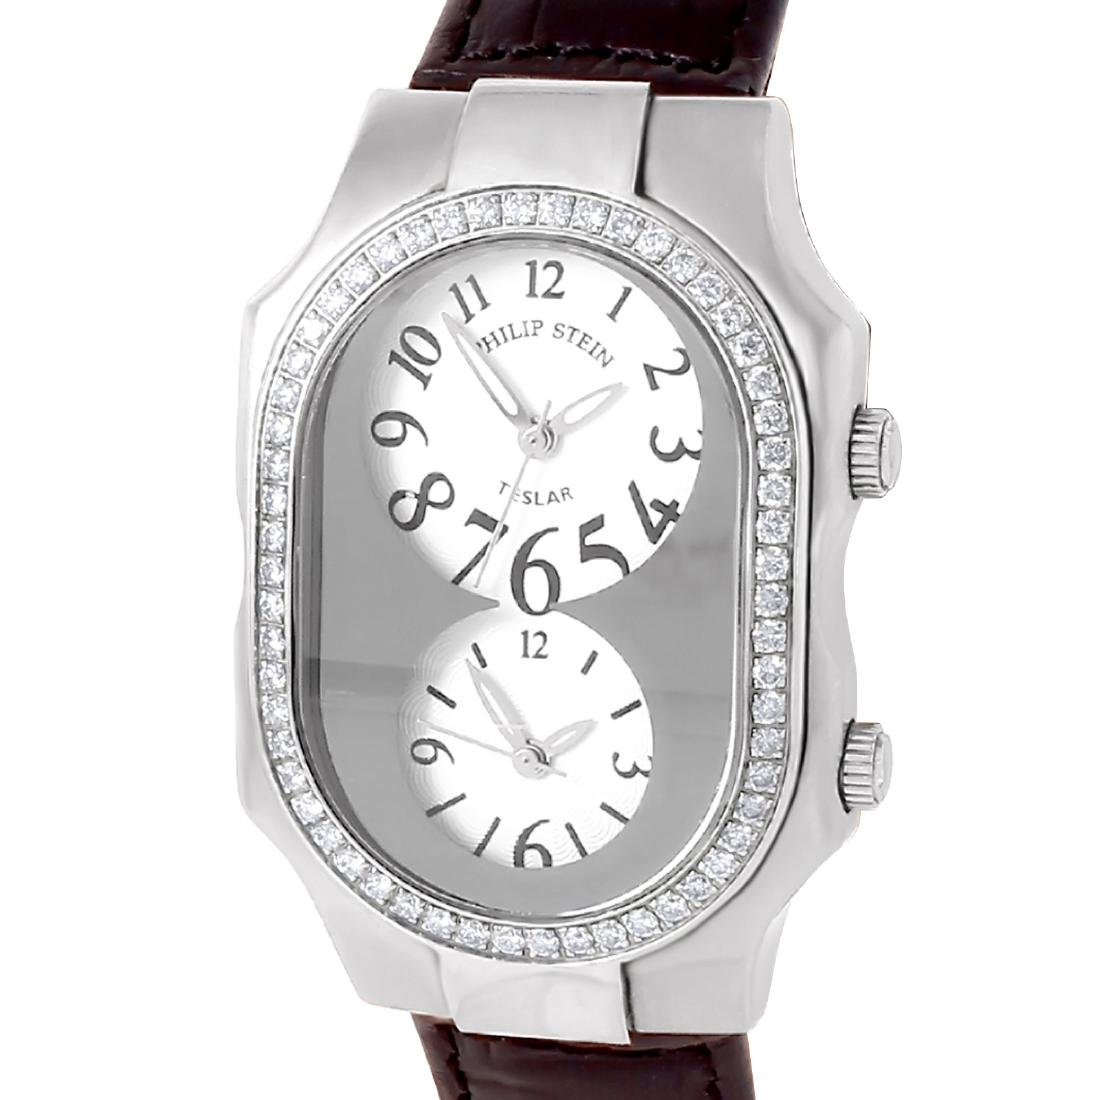 Philip Stein Teslar Stainless Steel Diamond Watch